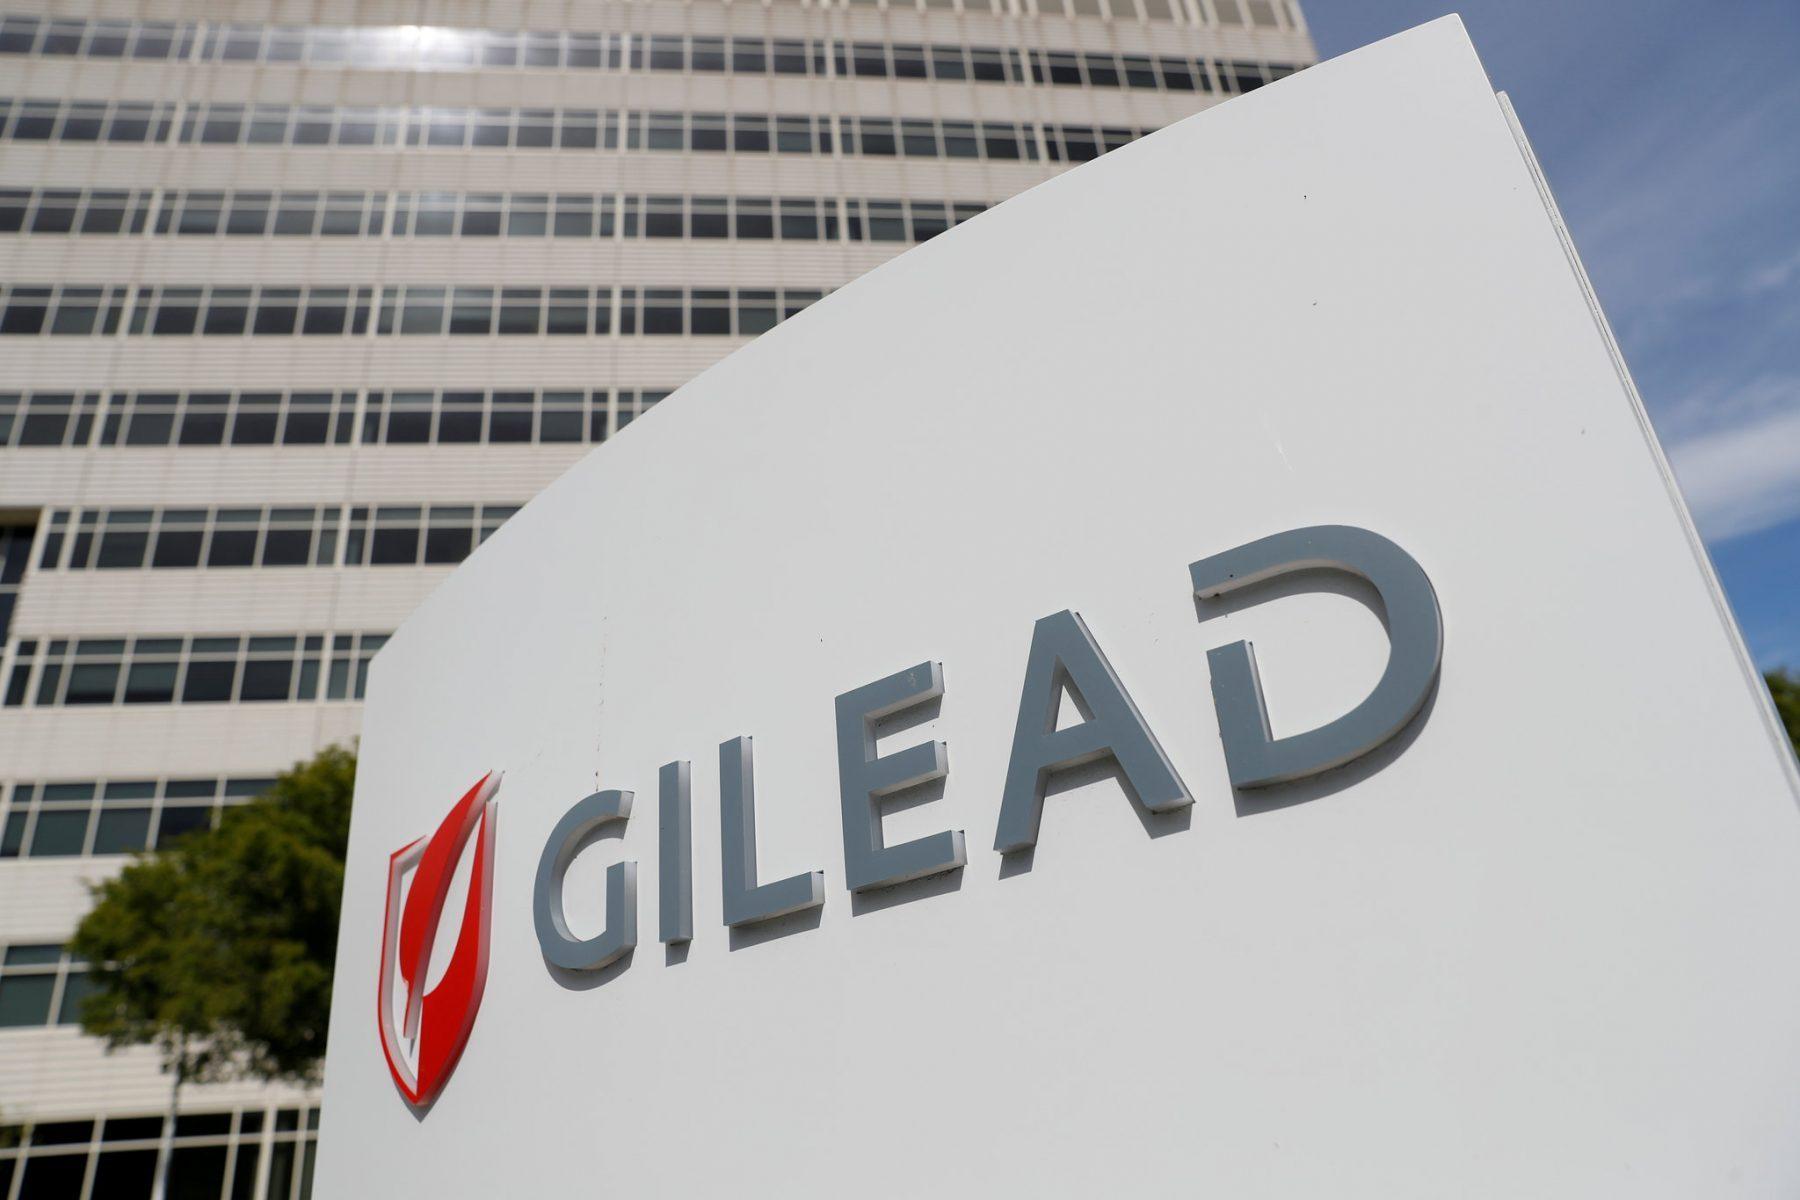 Gilead Sciences Inc: Νέα θεραπεία για την ρευματοειδή αρθρίτιδα